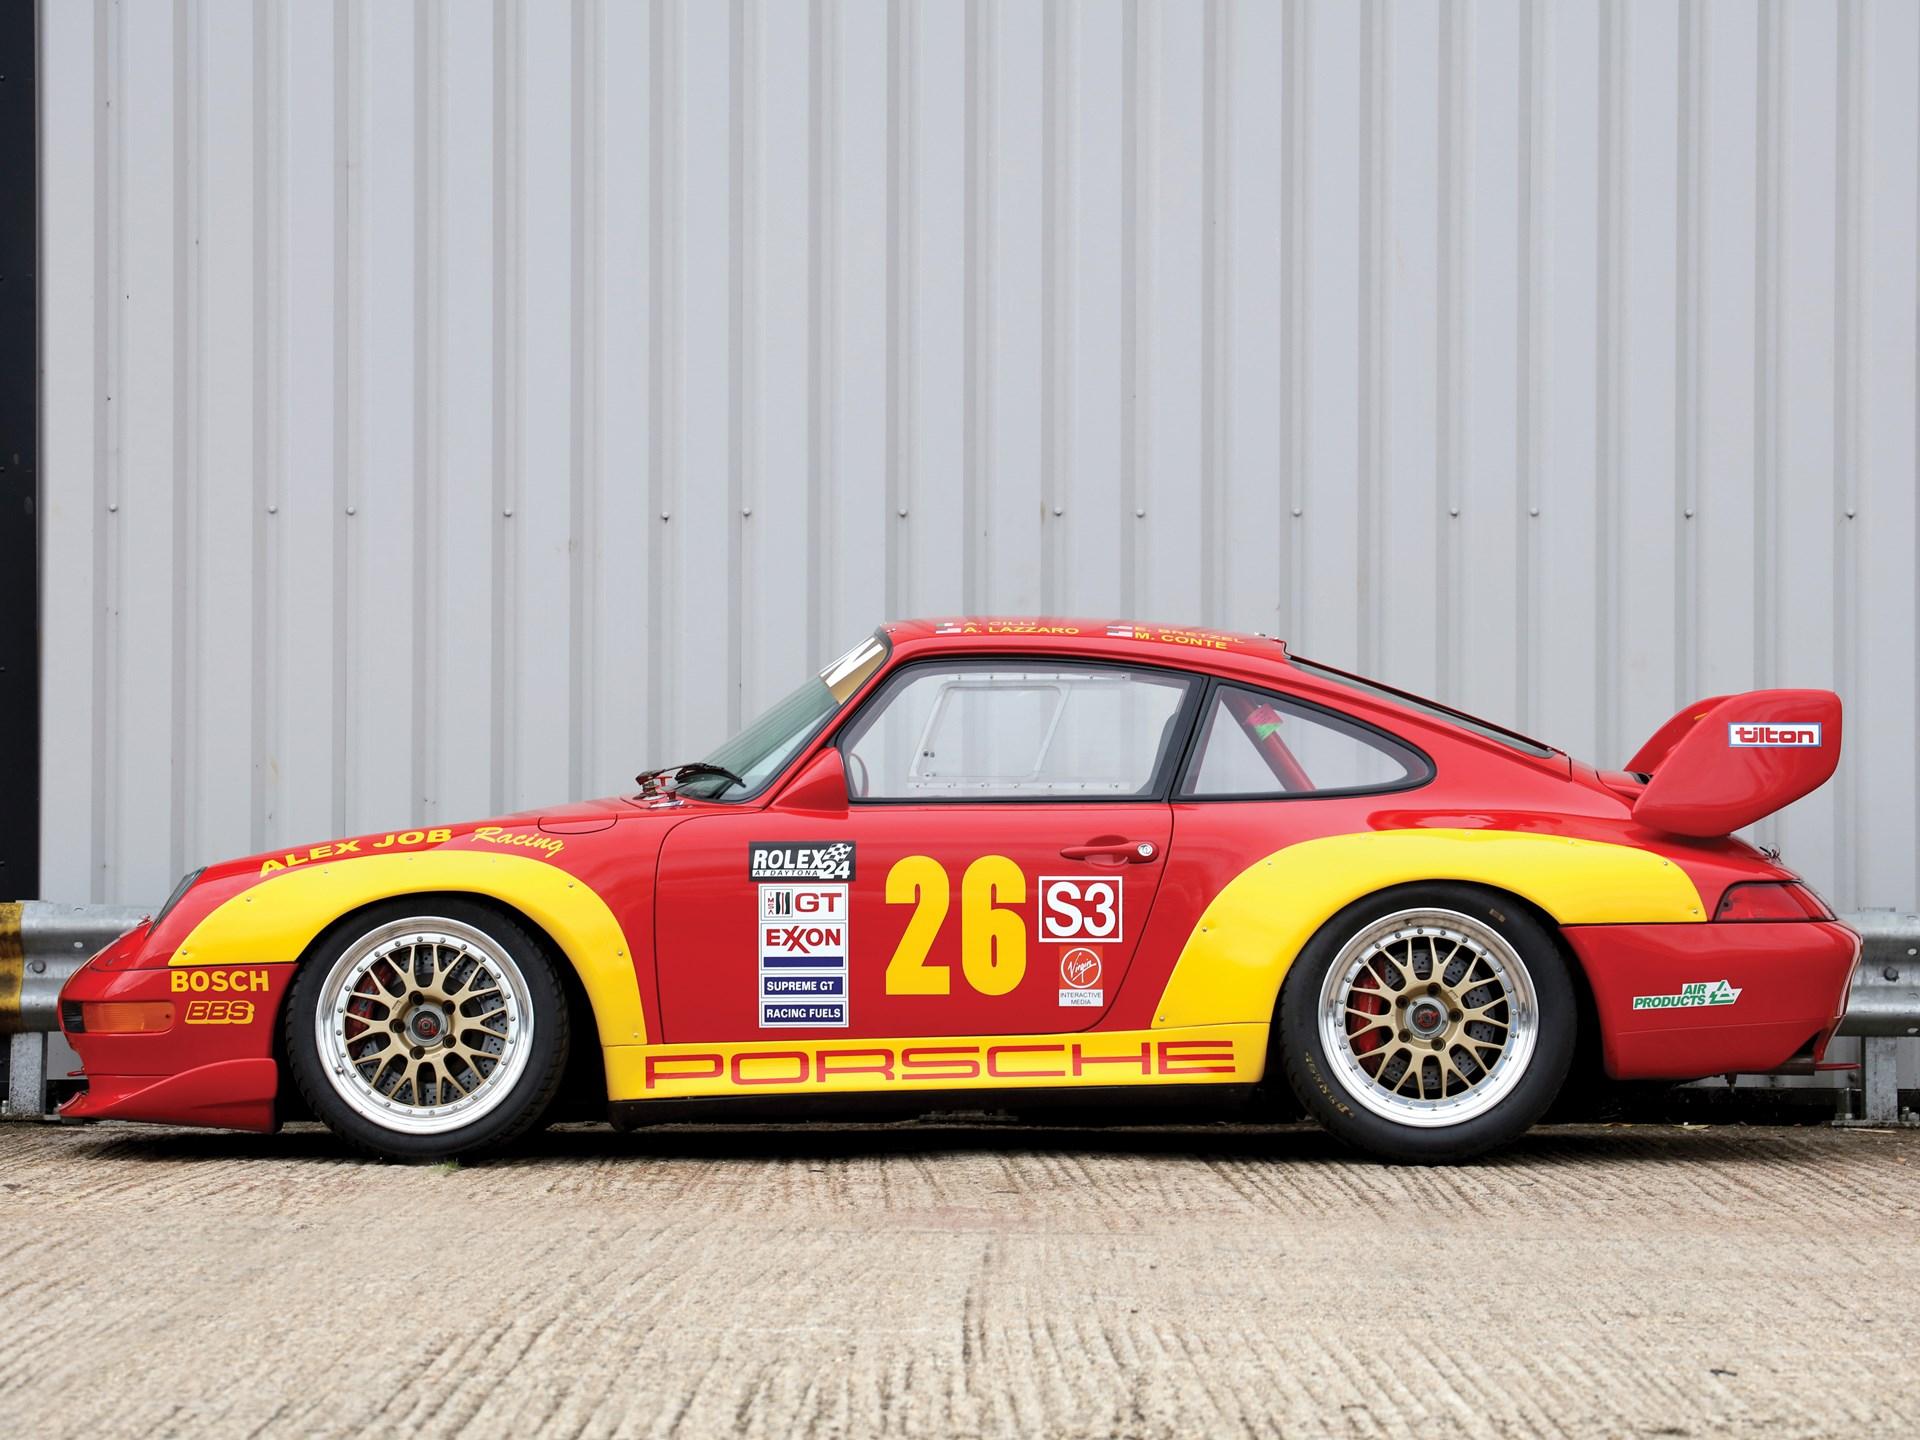 1997 Porsche 911 Carrera RSR